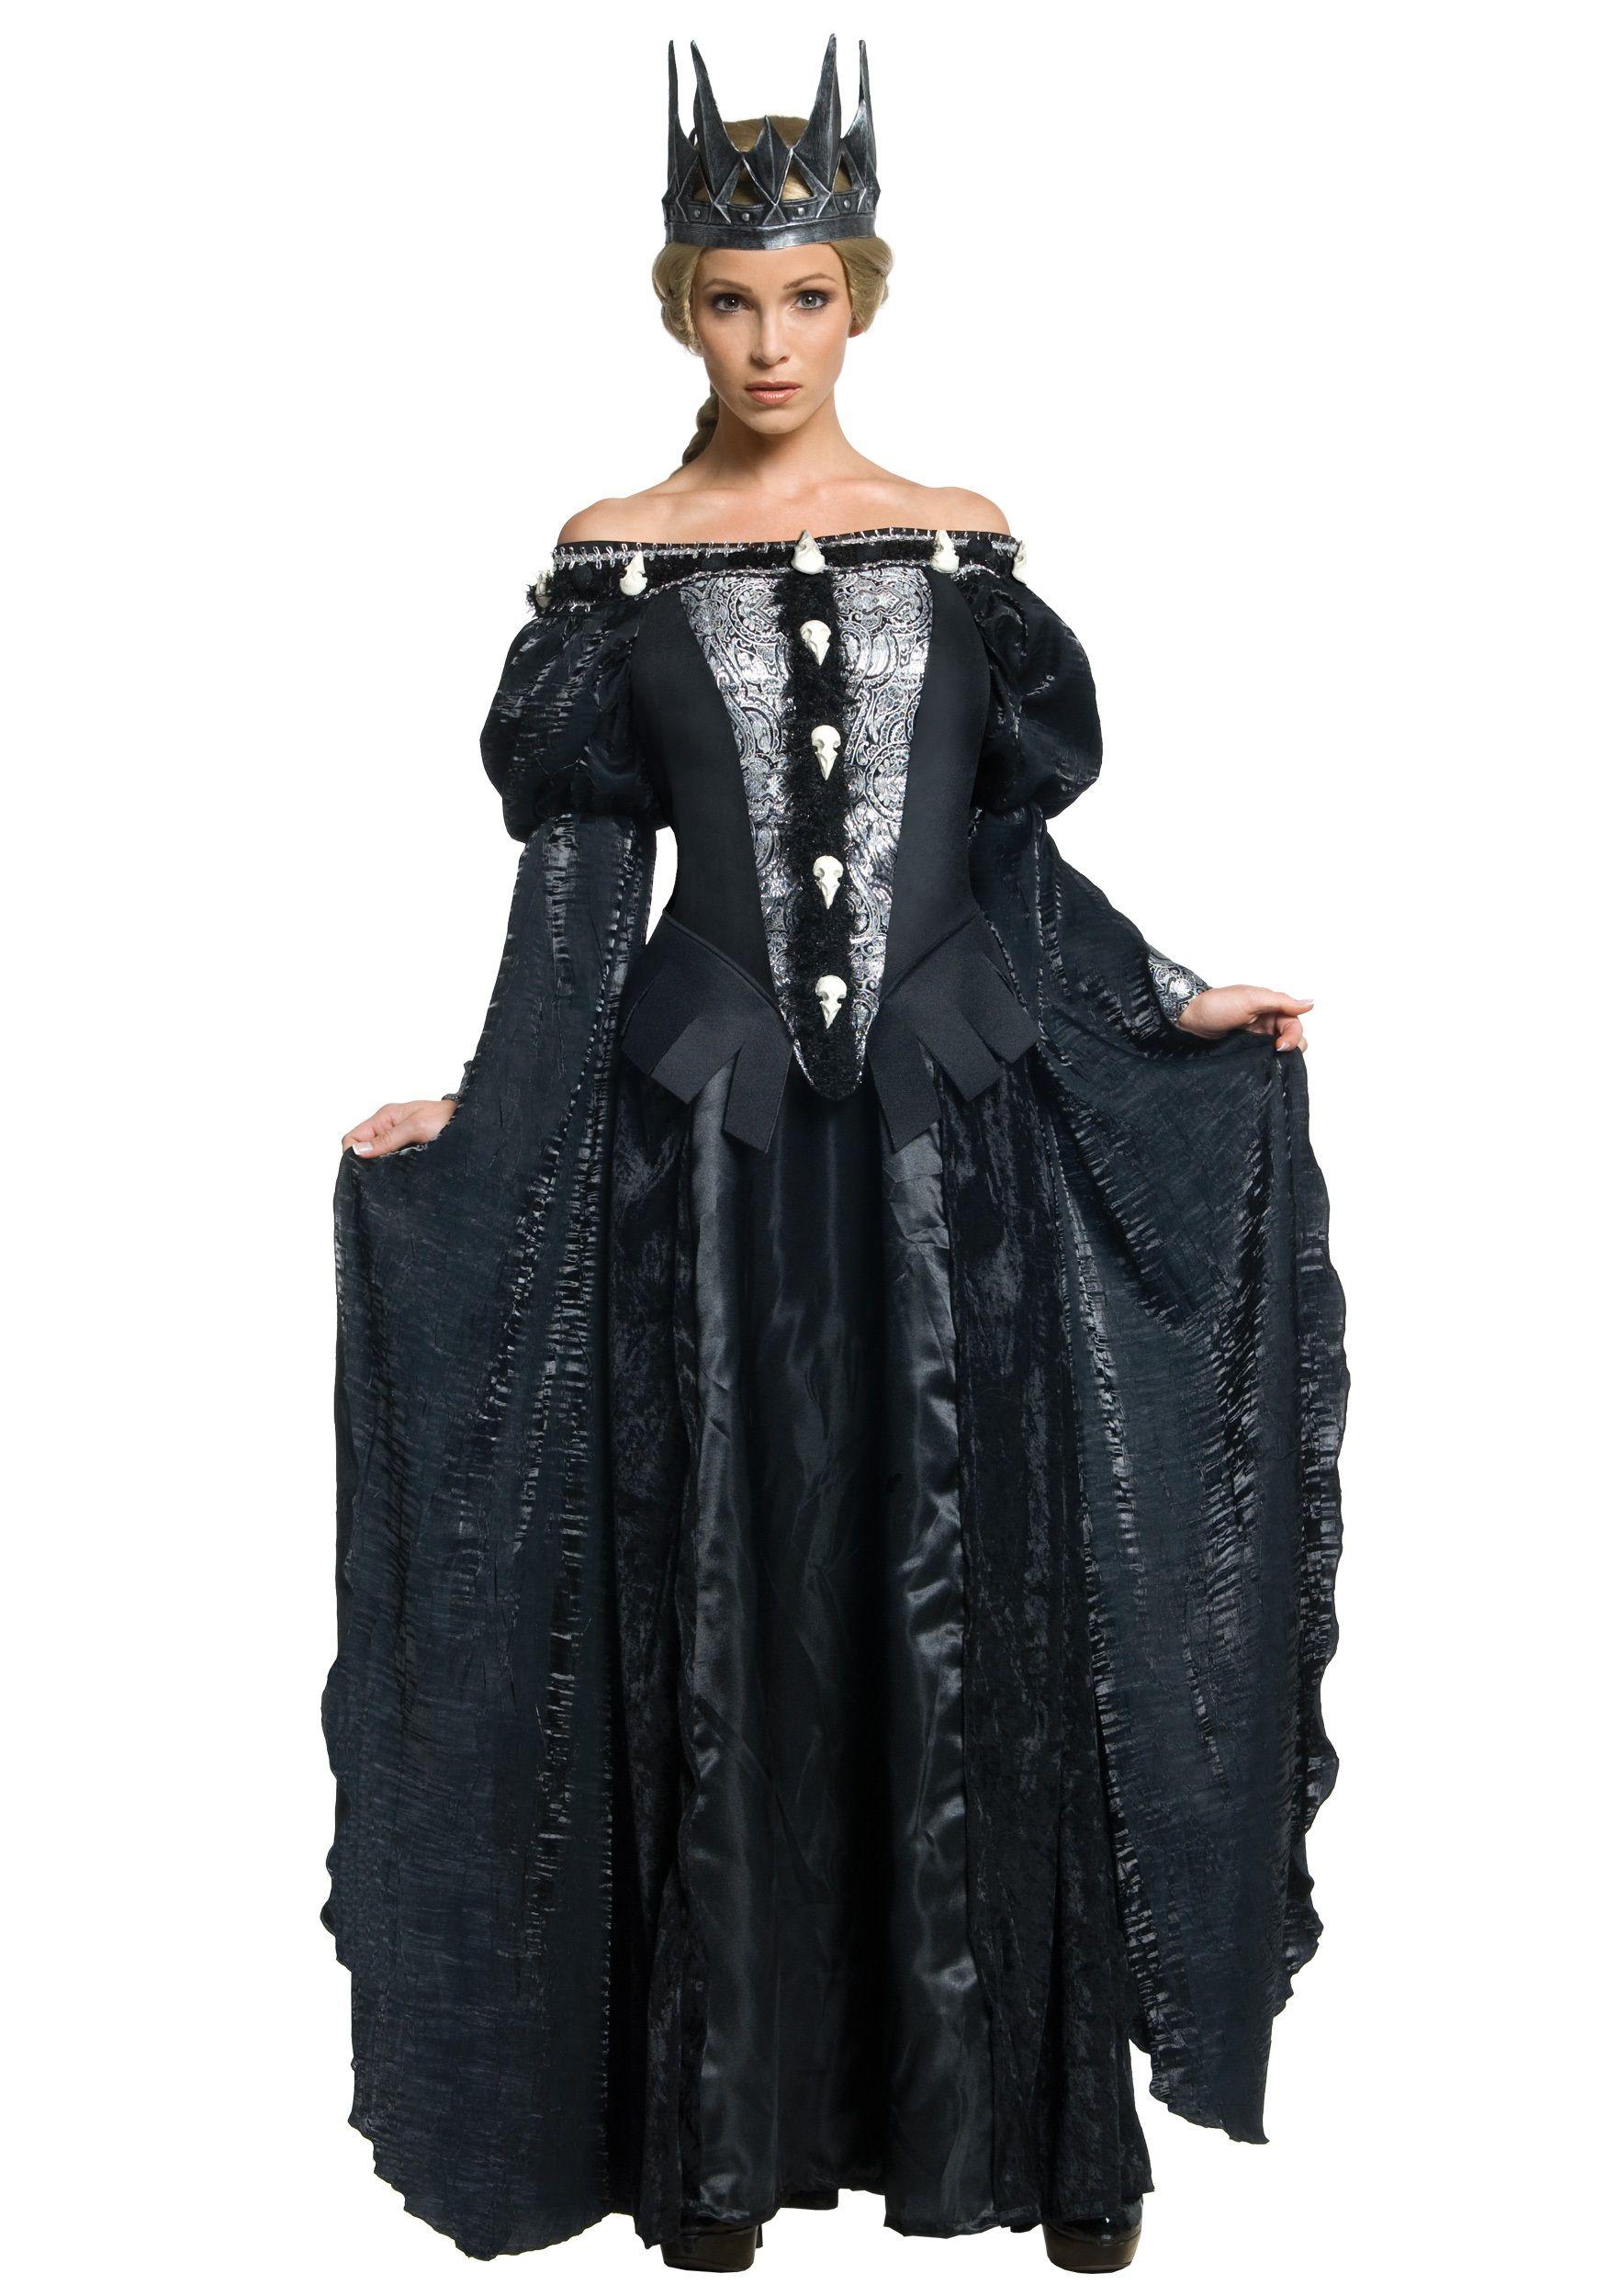 Deluxe Queen Ravenna Skull Dress | Knight Wedding | Pinterest ...